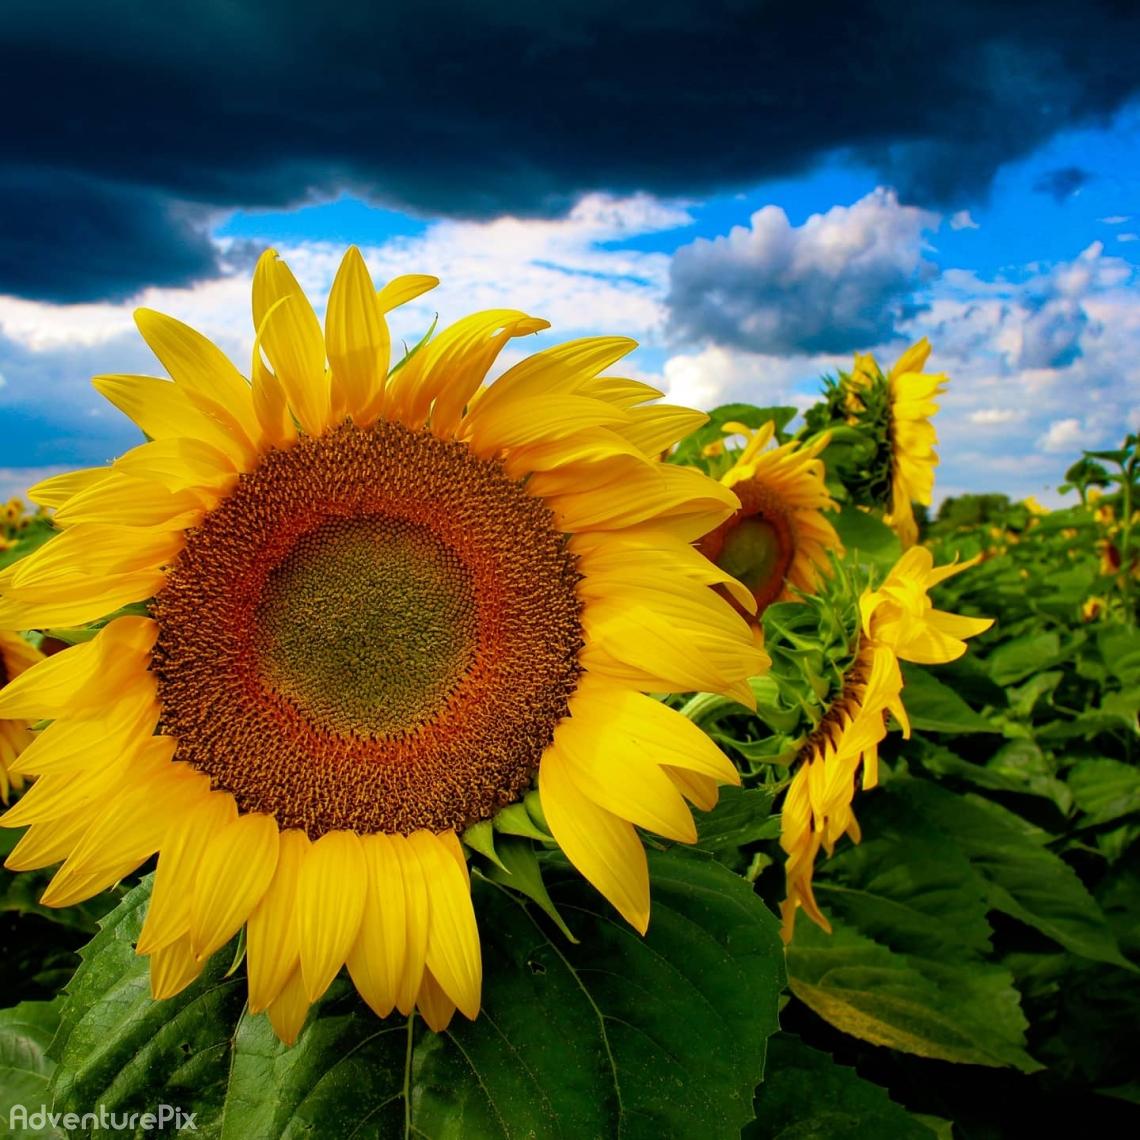 Sunshine & heavy clouds